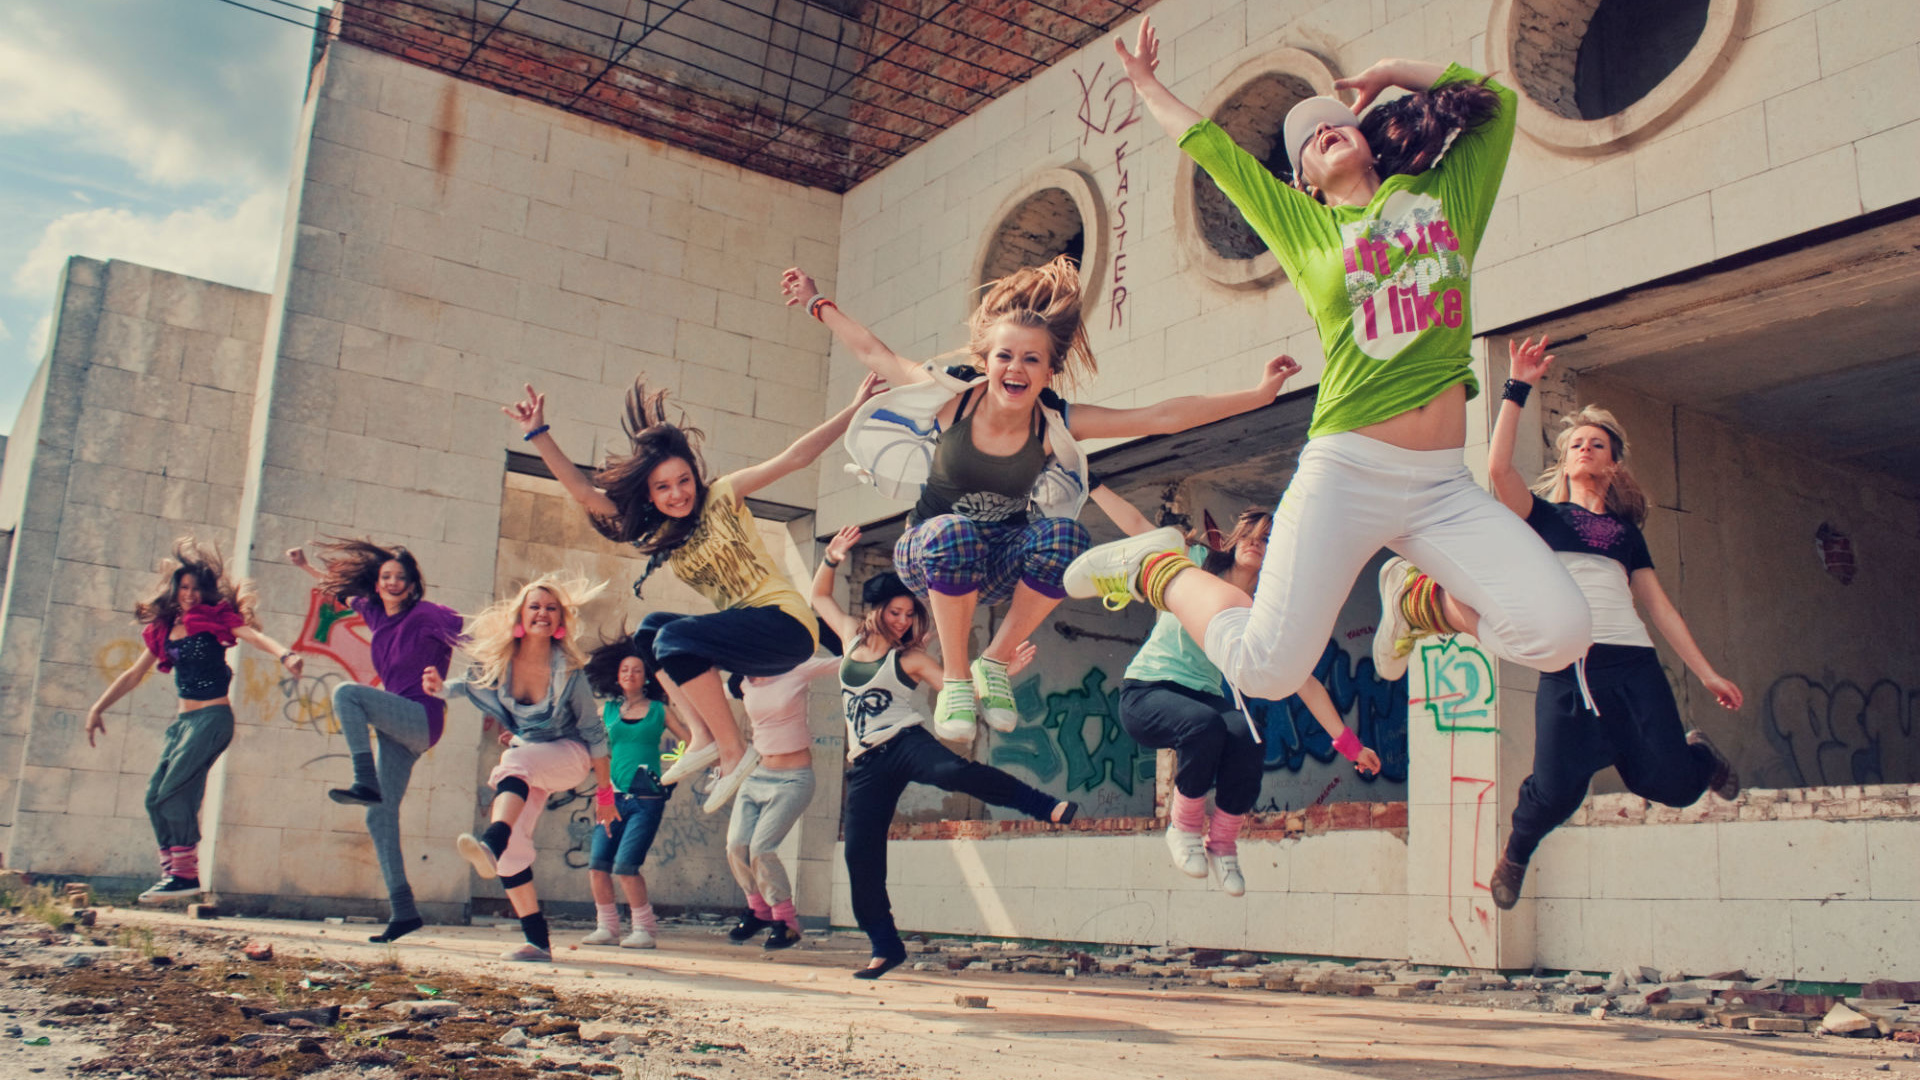 позитивные картинки про танцы себя